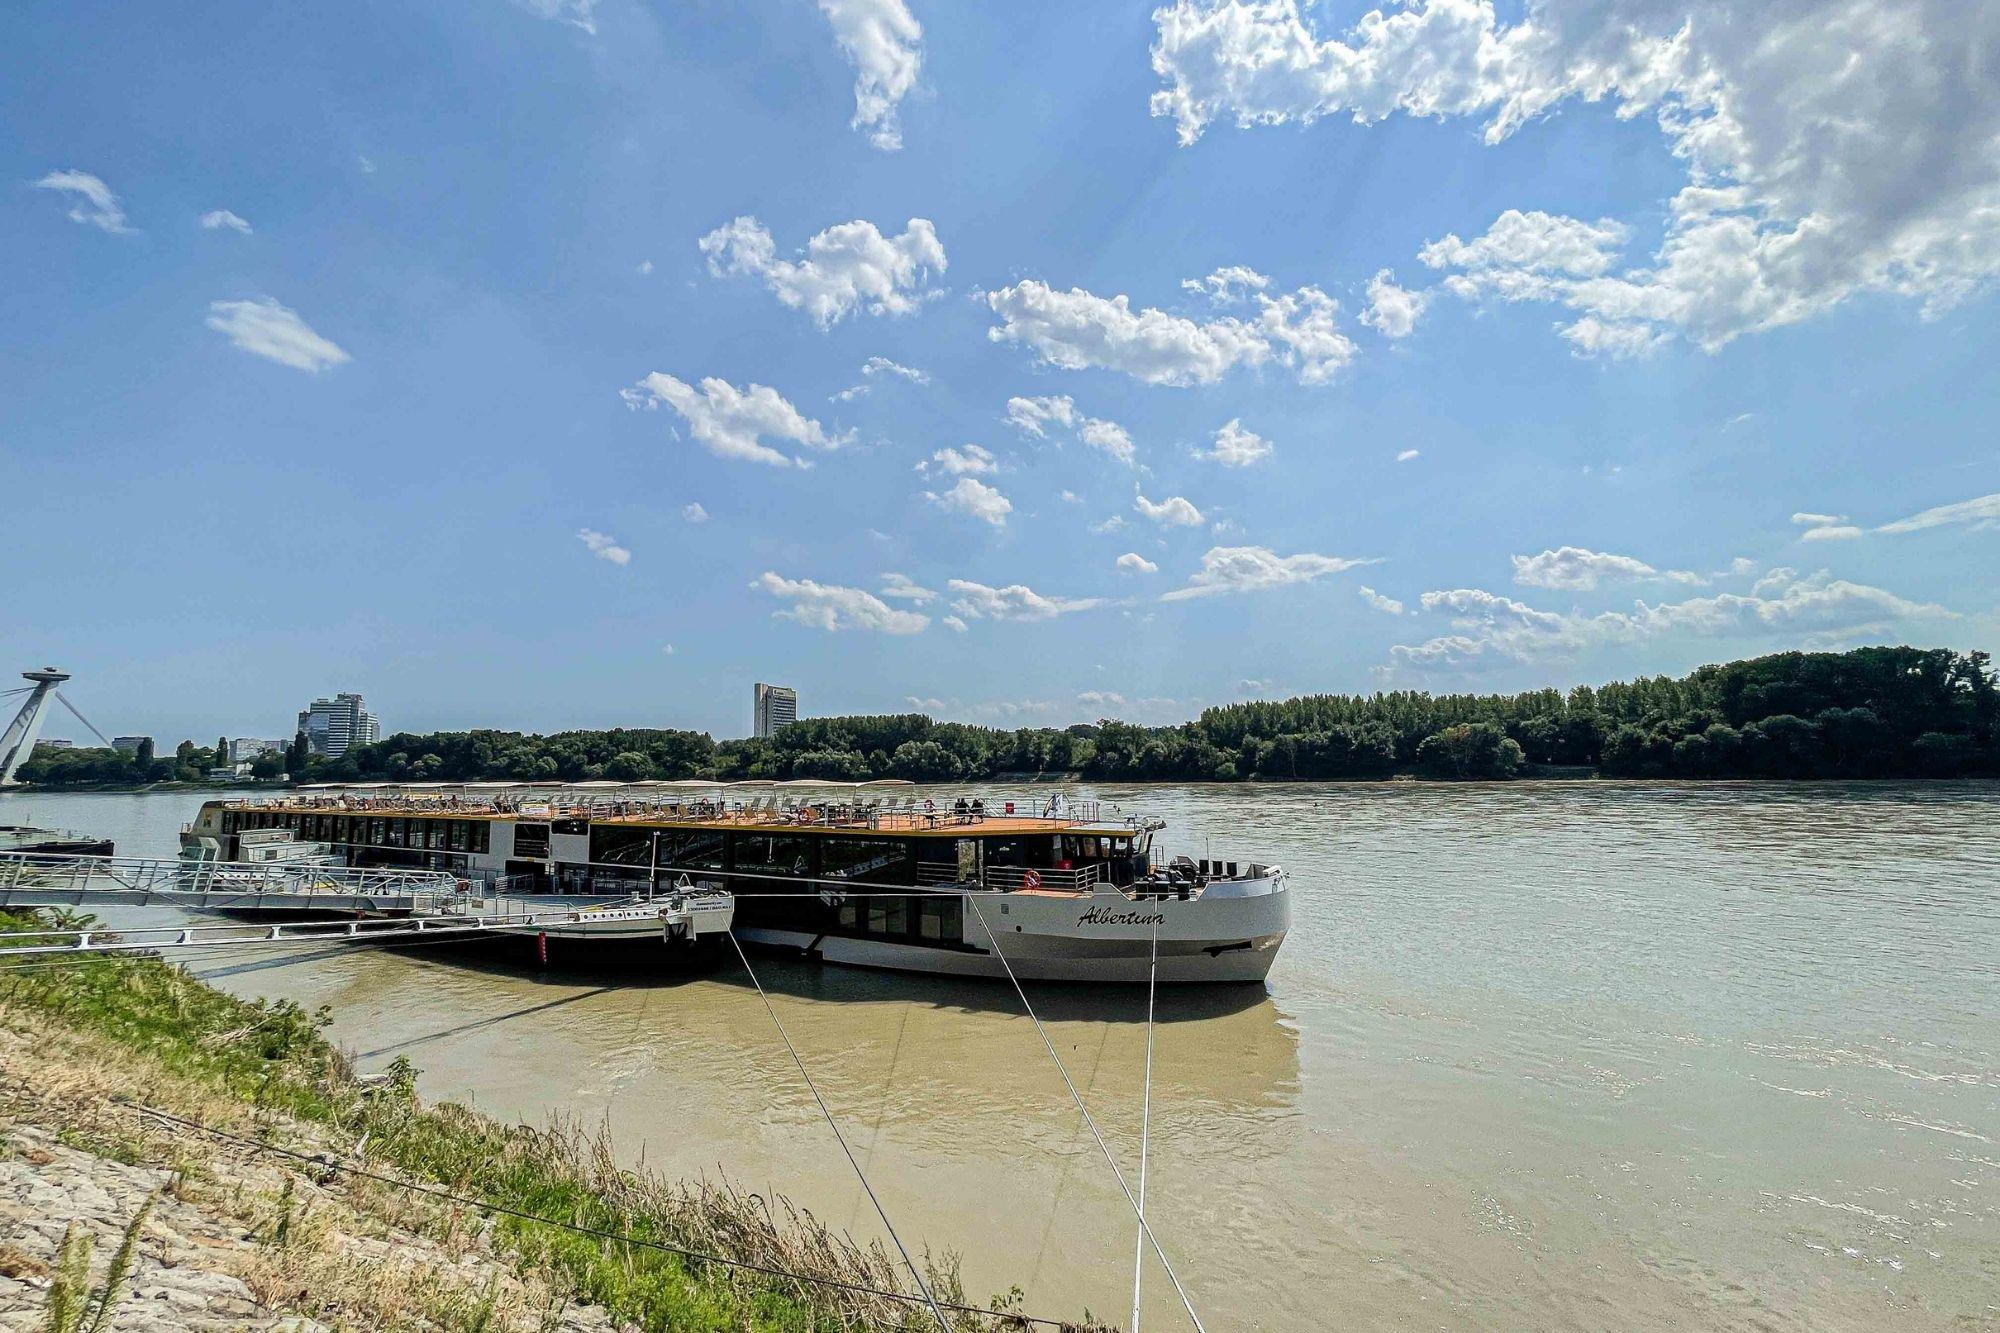 MS ALBERTINA: Fazit zu unserer Donau-Kreuzfahrt mit SE-Tours